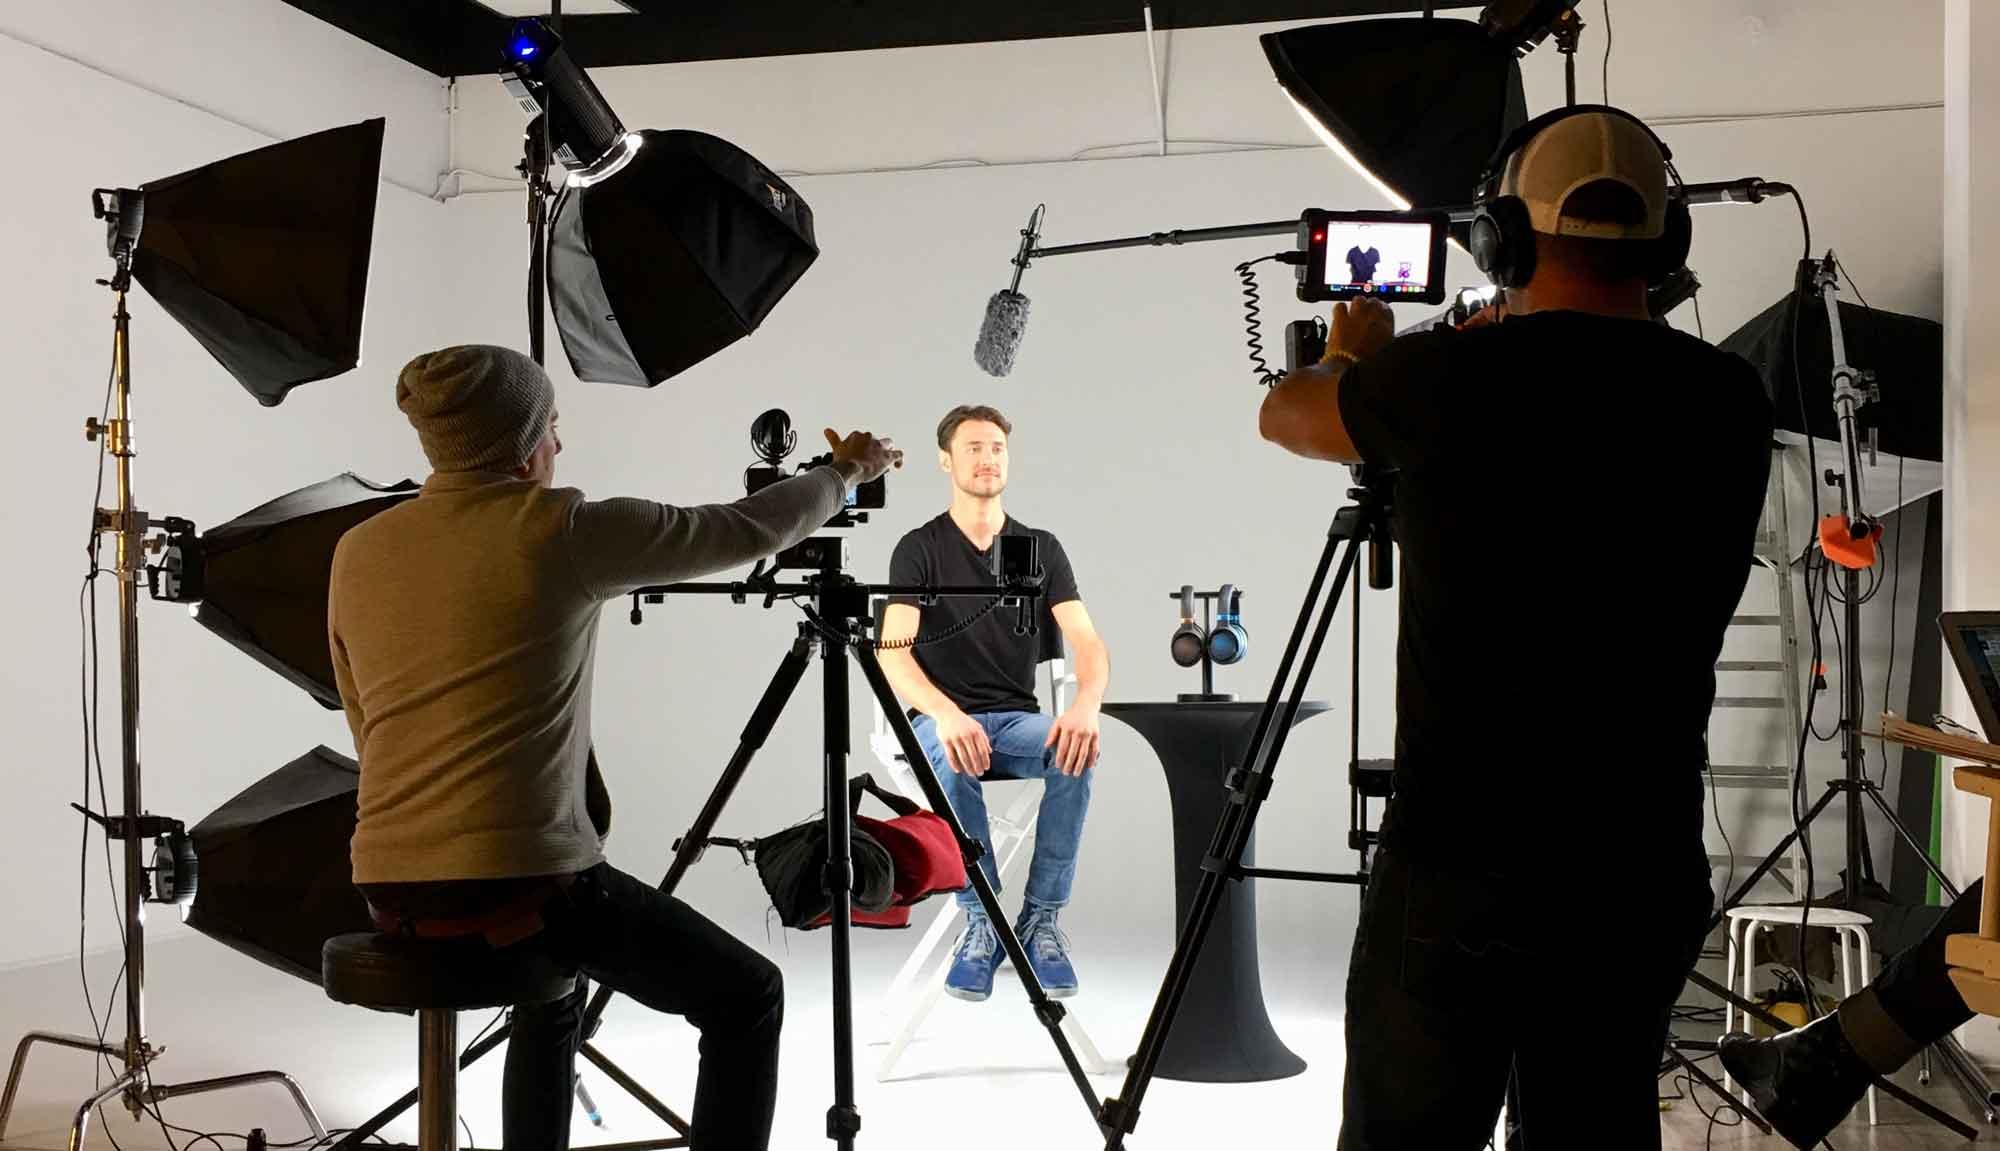 Video-Studio-Filming-Production.jpg